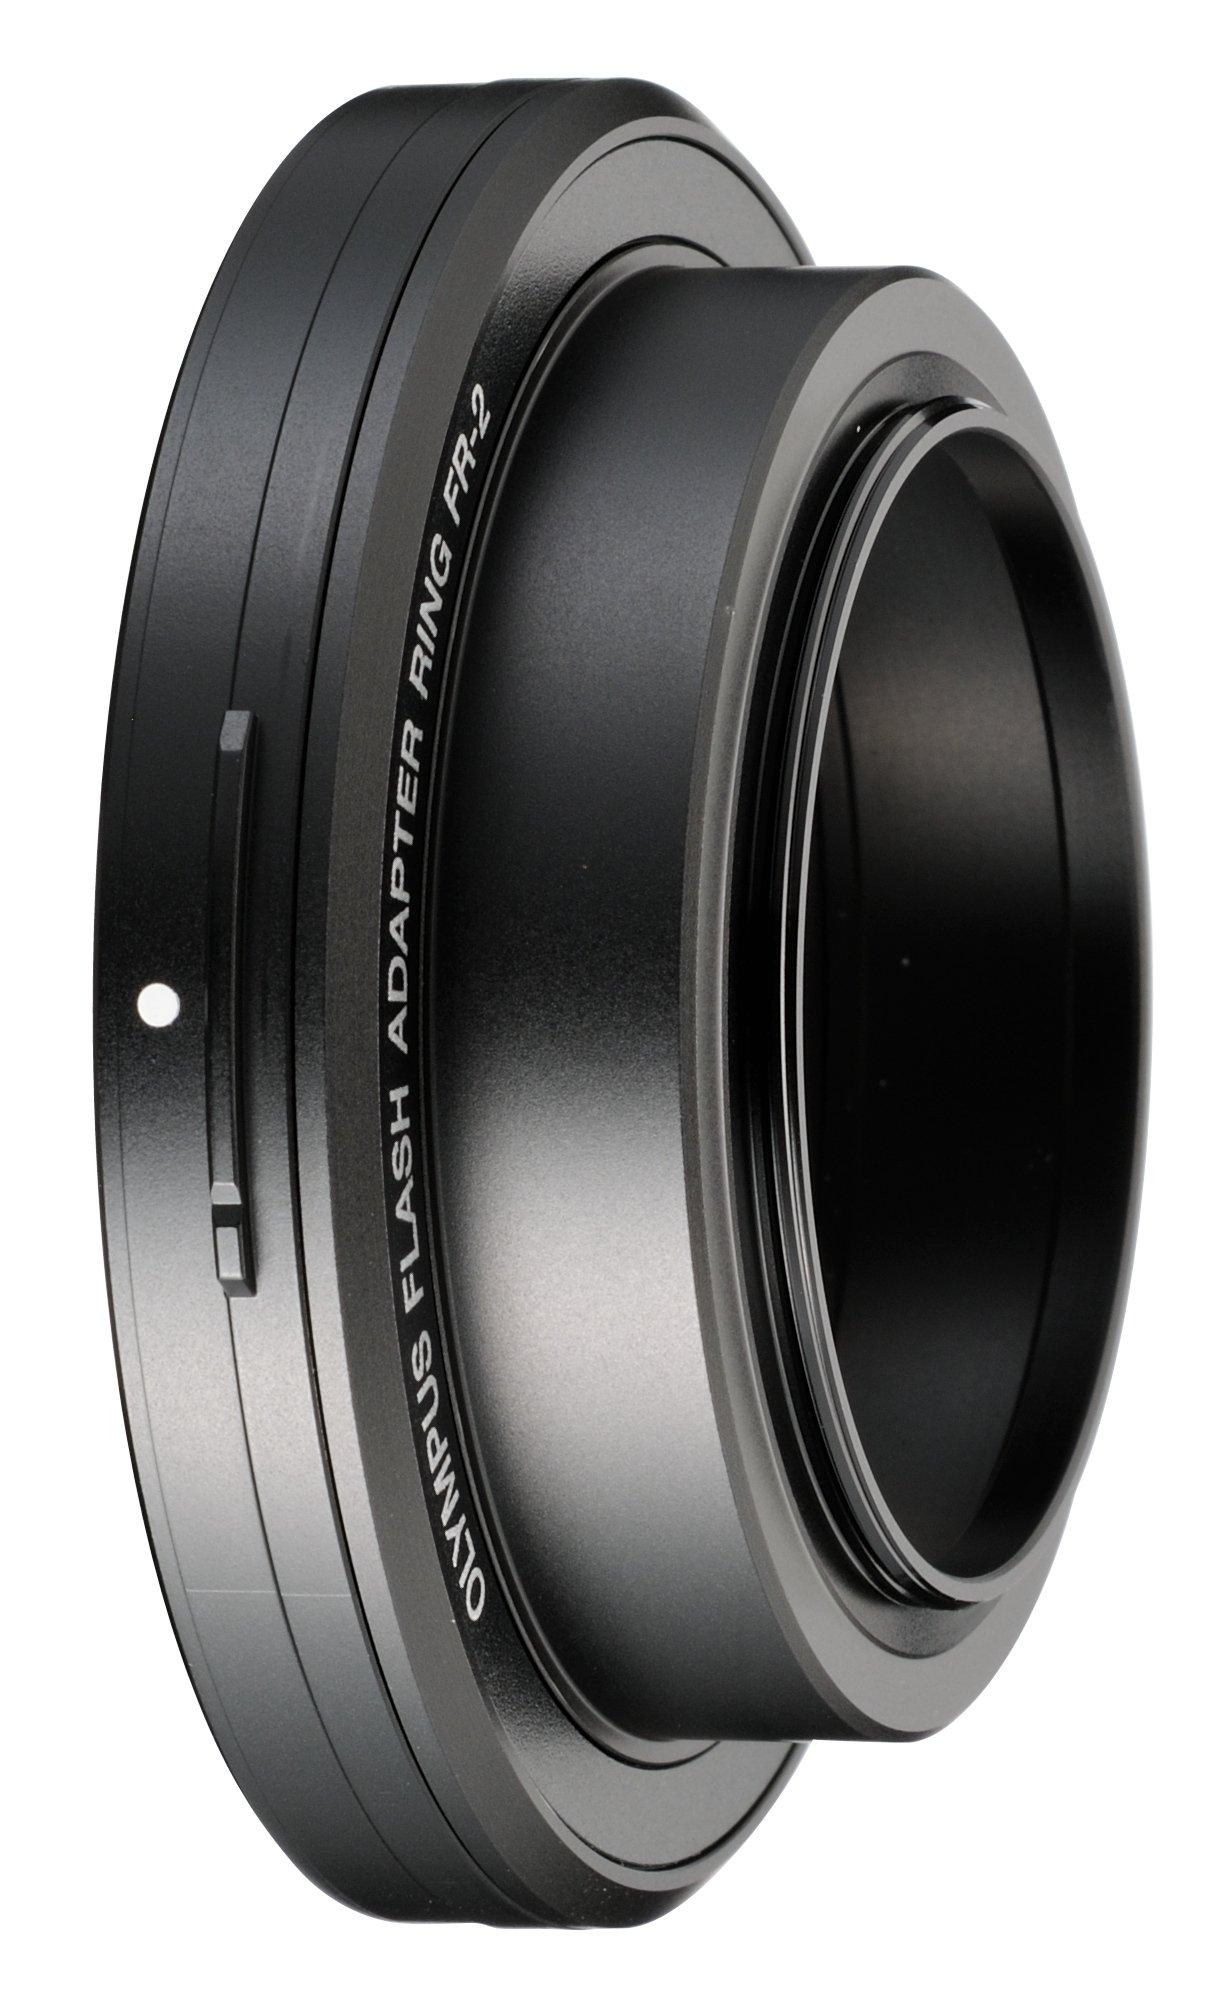 Olympus FR-2 Flash Adapter Ring for Macro Flash System